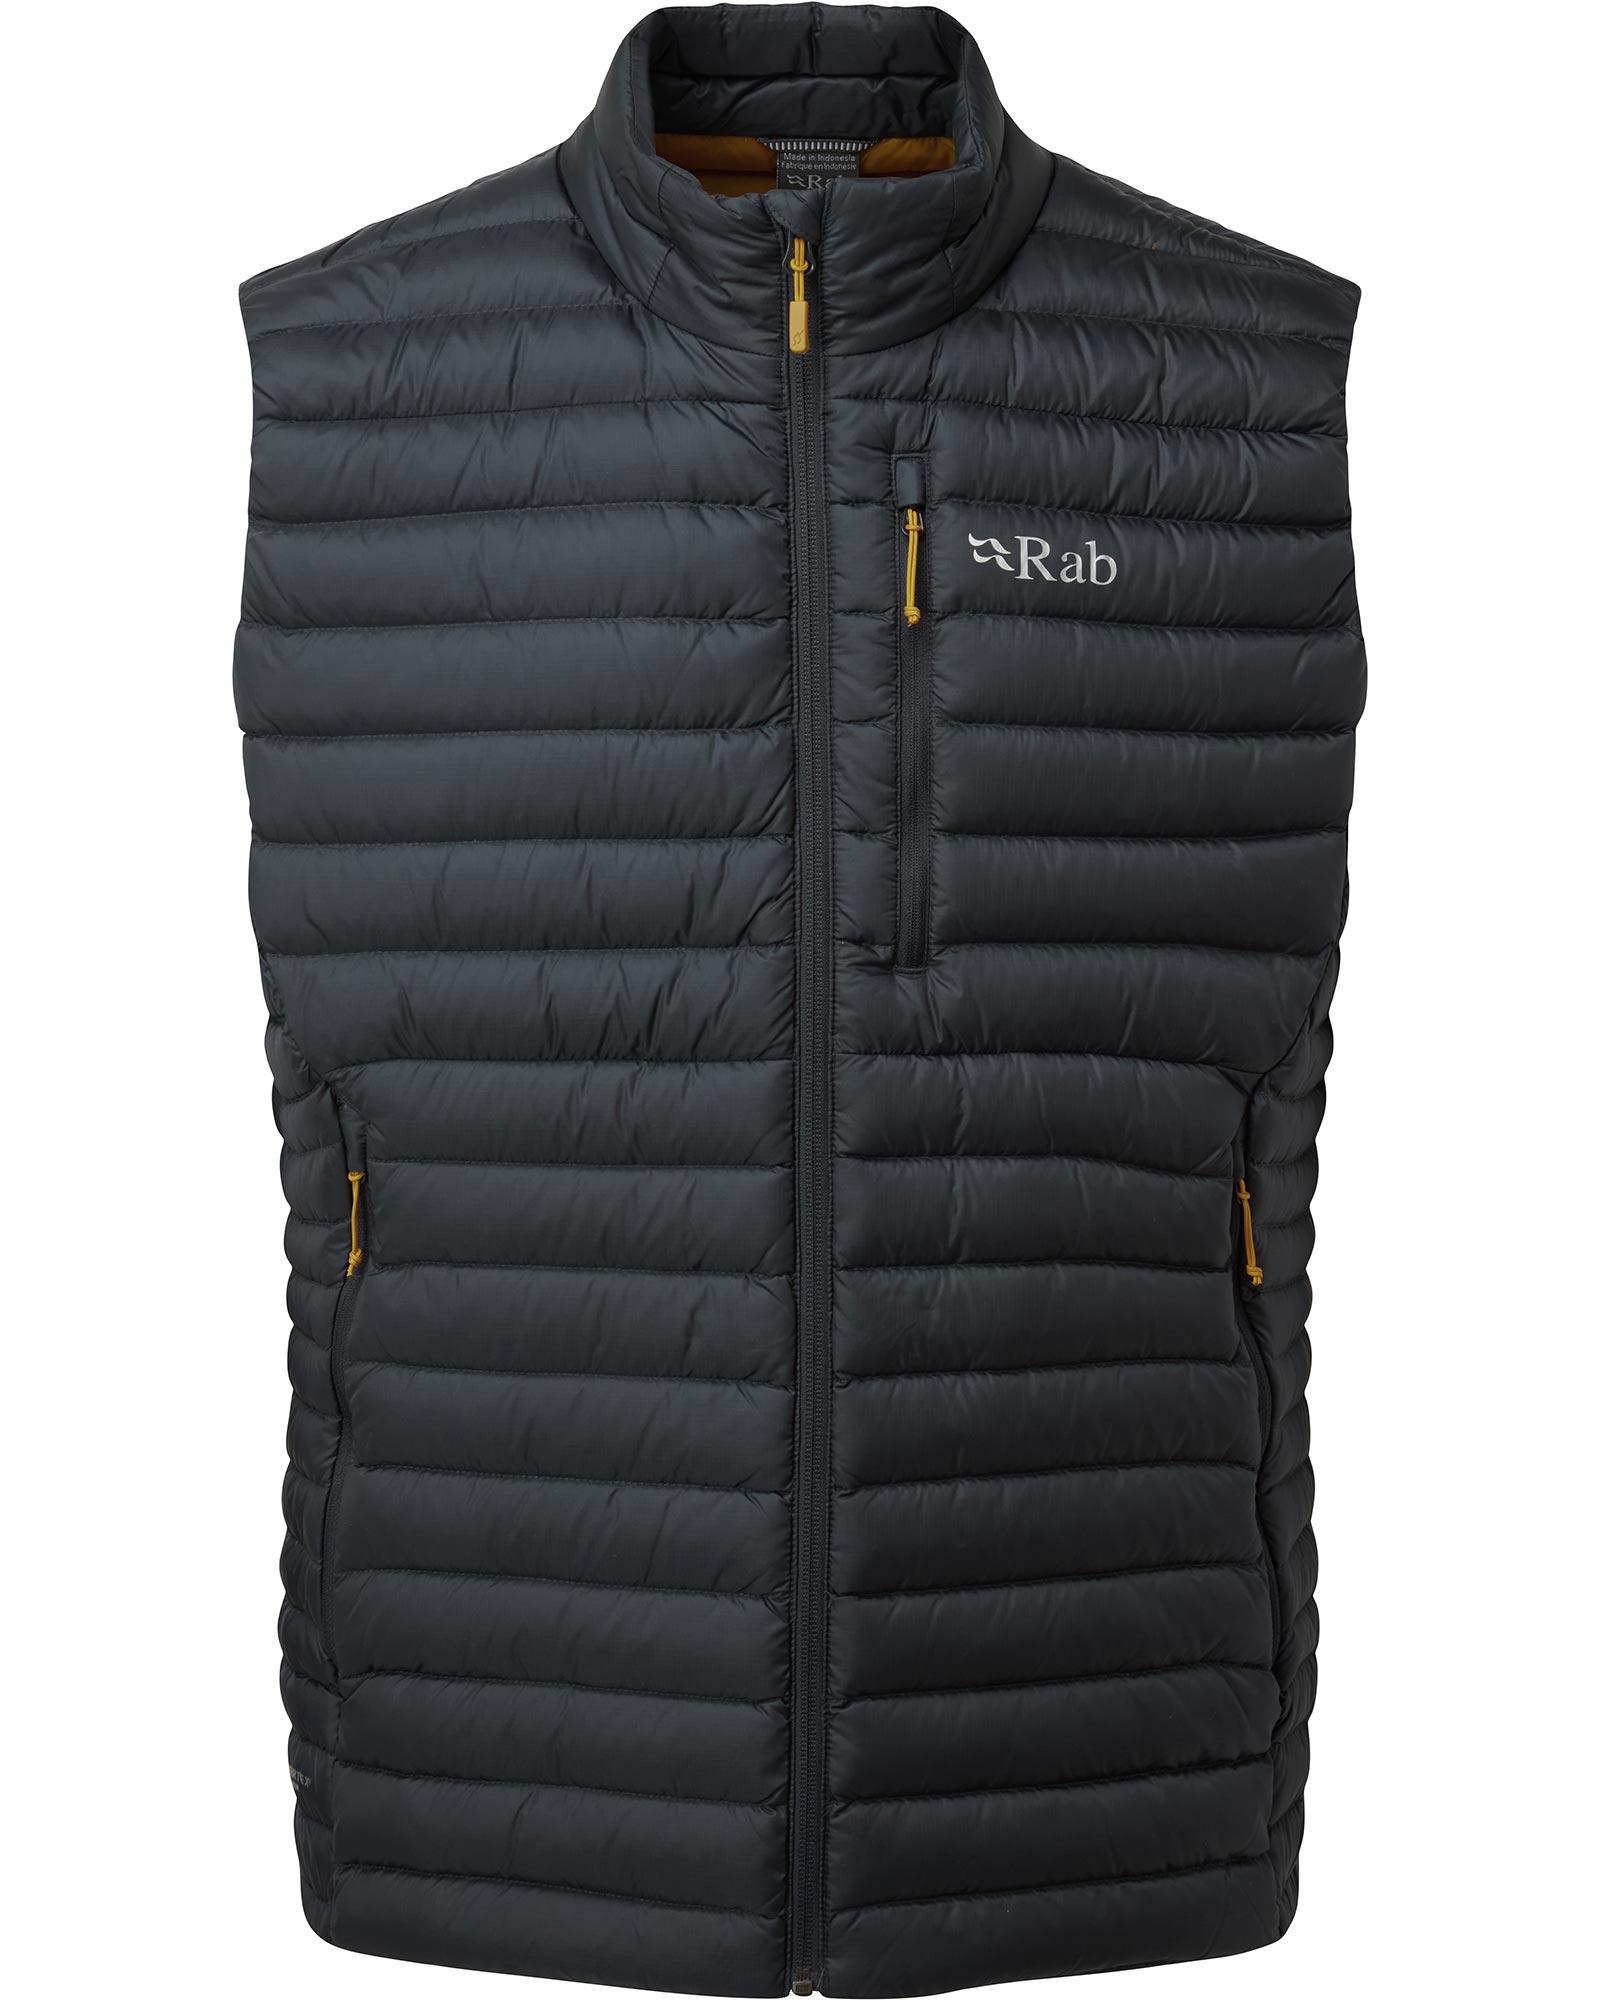 Rab Men's Microlight Vest 0